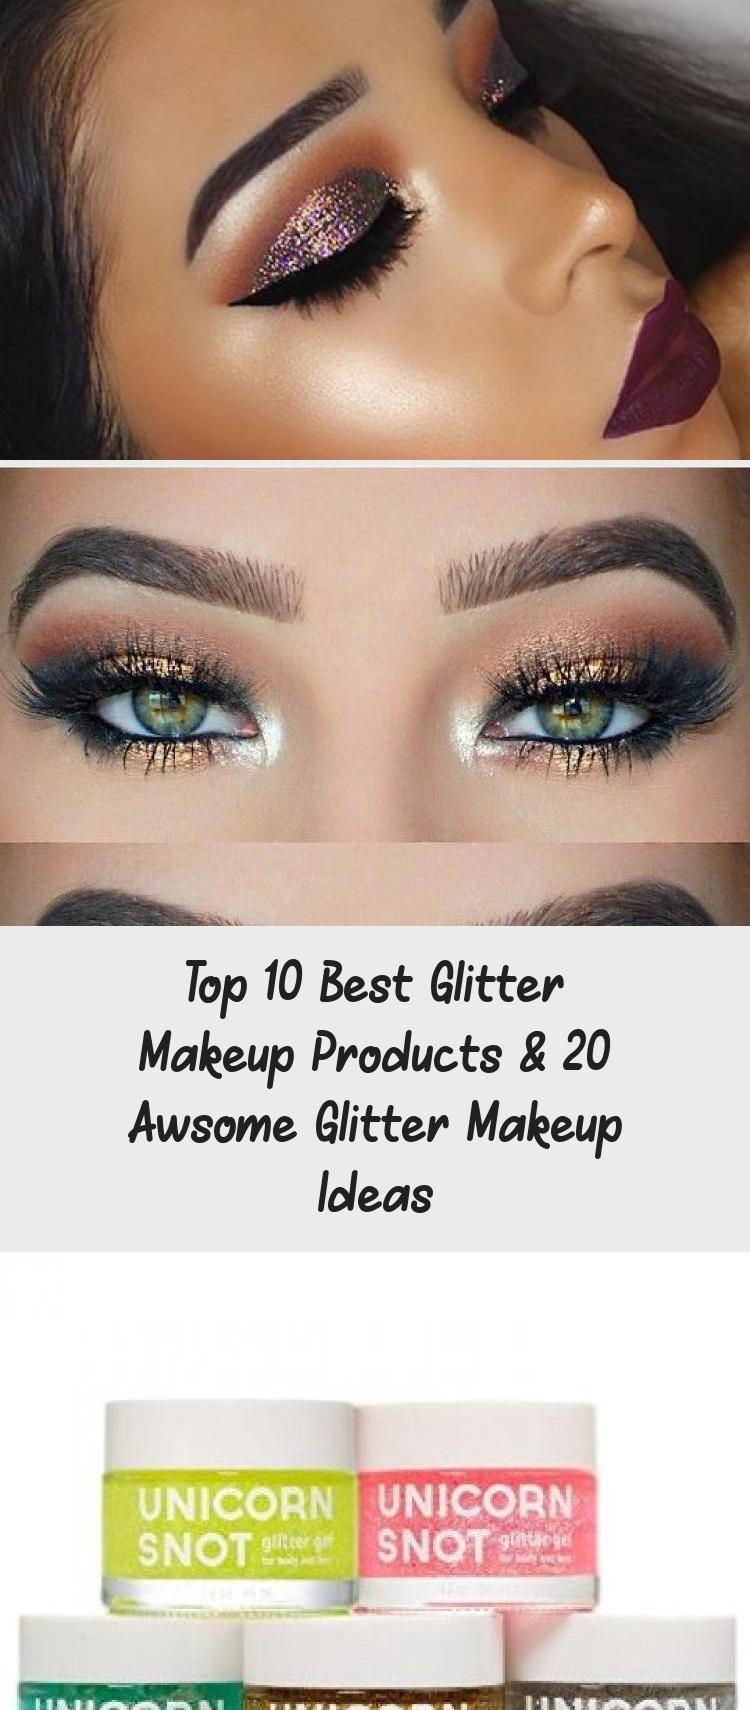 Top 10 Best Glitter Makeup Products & 20 Awsome Glitter